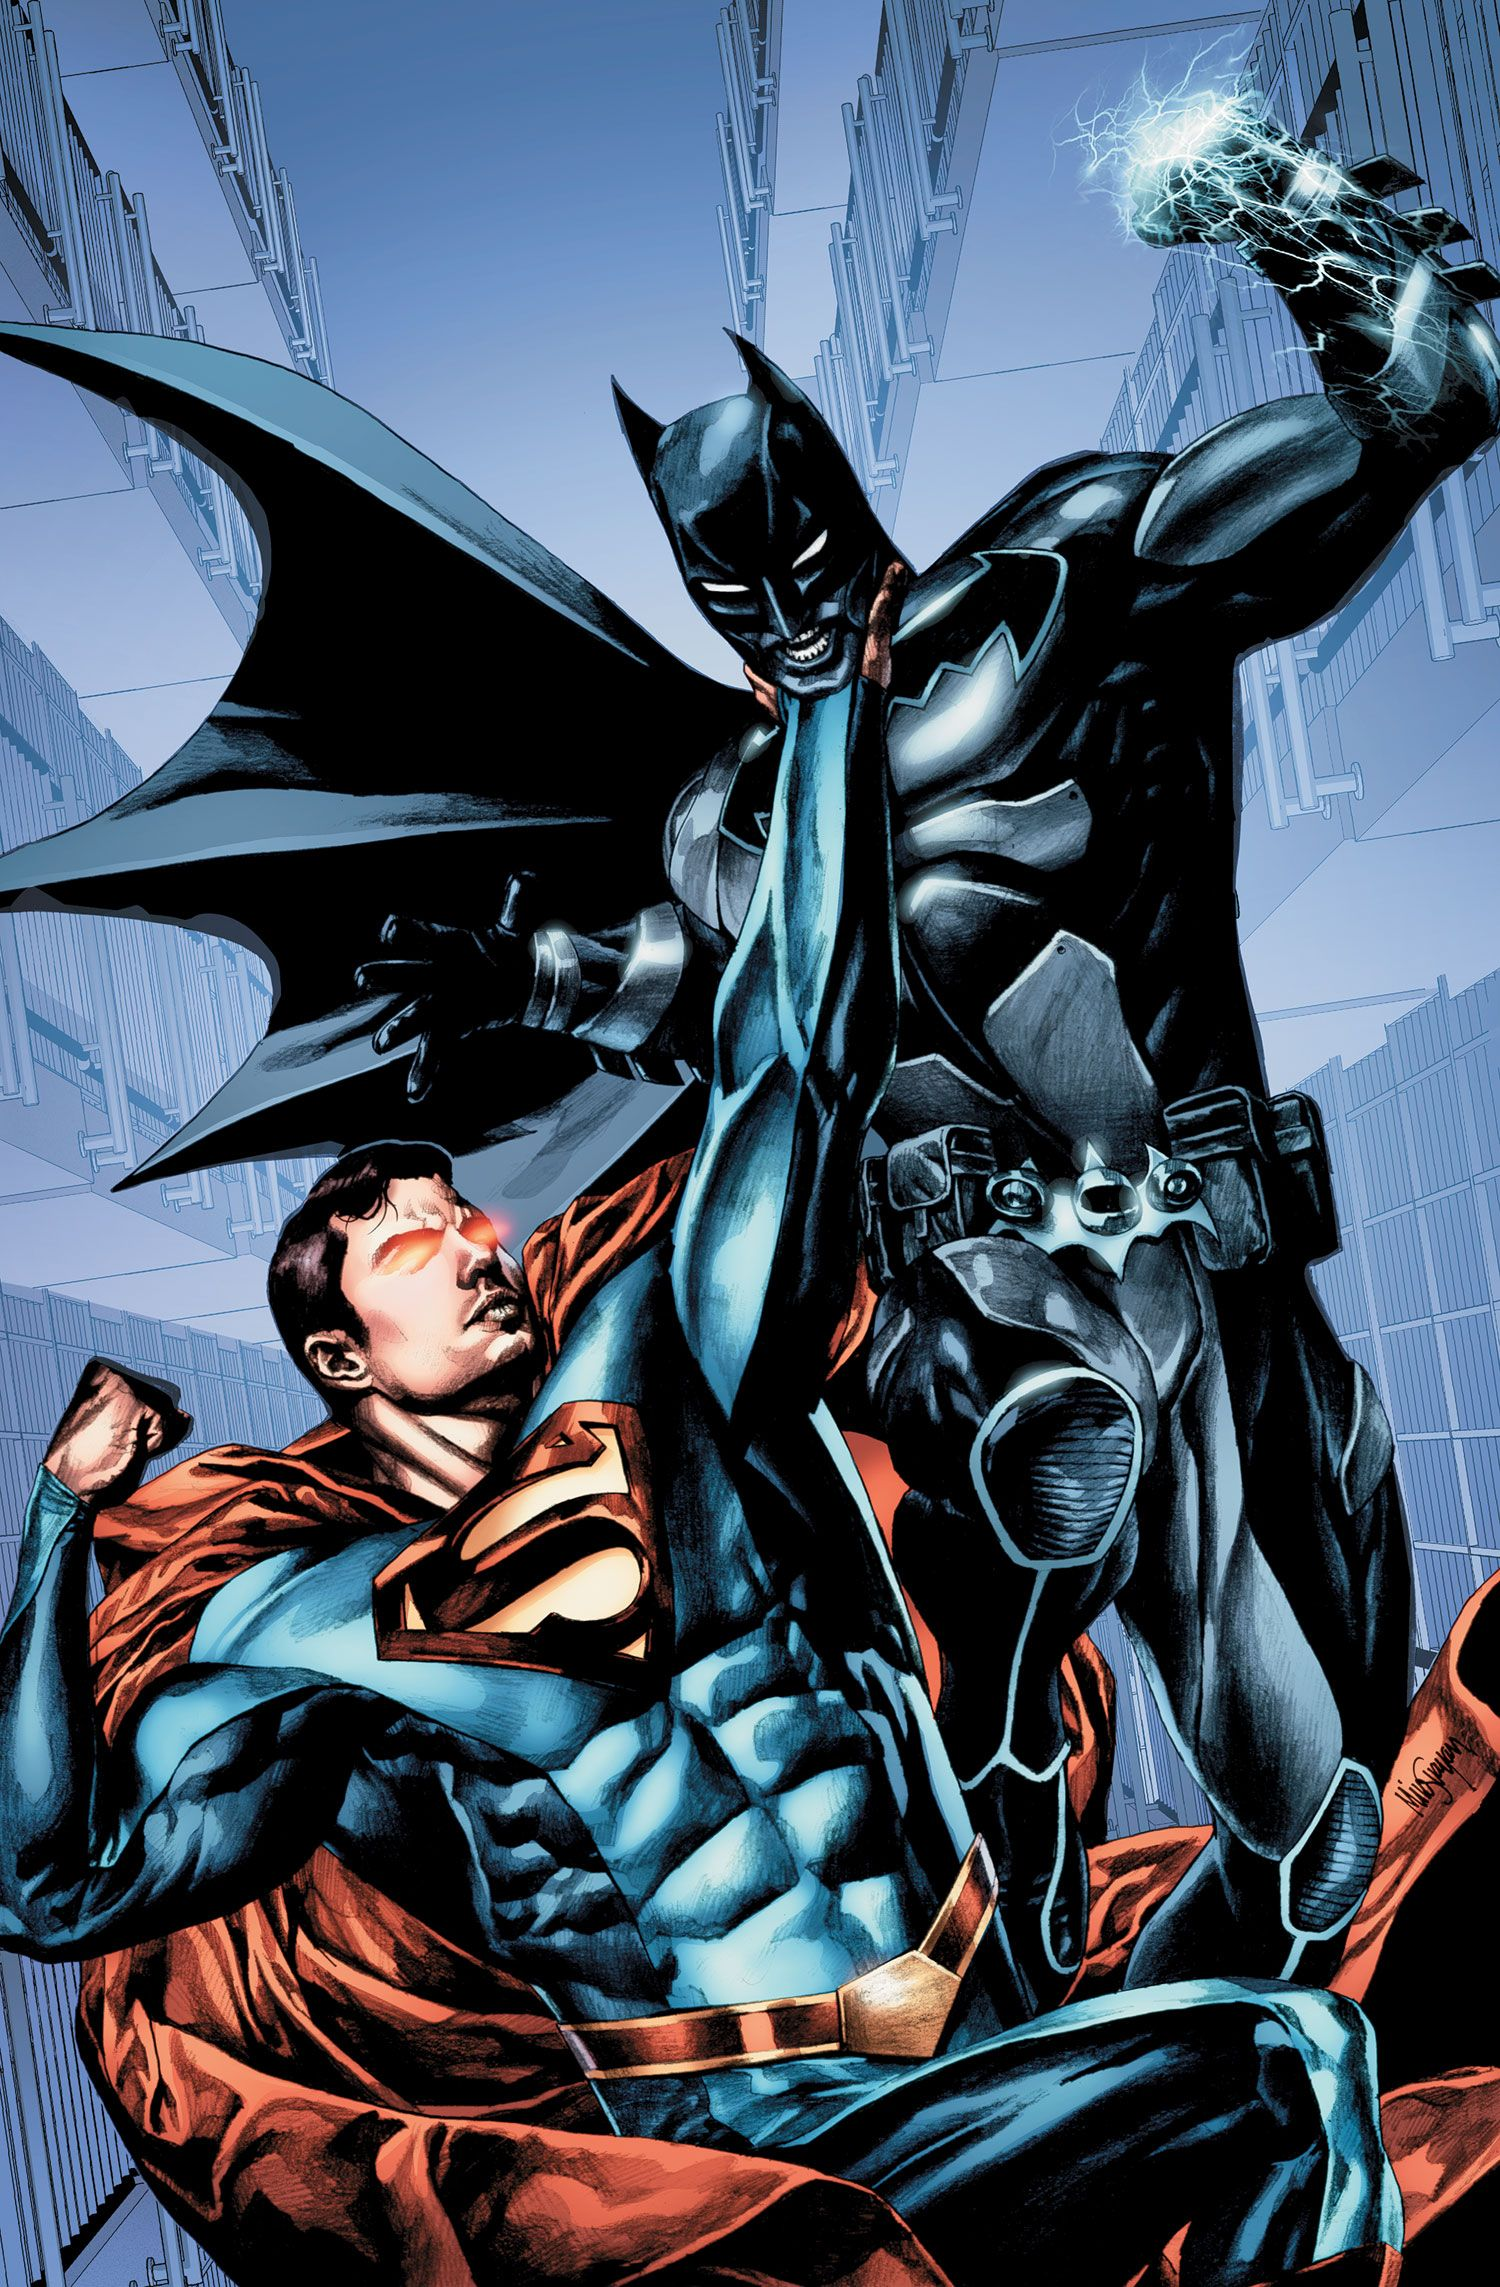 #Superman #Fan #Art. (SMALLVILLE: SEASON 11 #2 Cover) By: Bryan Q. Miller. ÅWESOMENESS!!!™ ÅÅÅ+